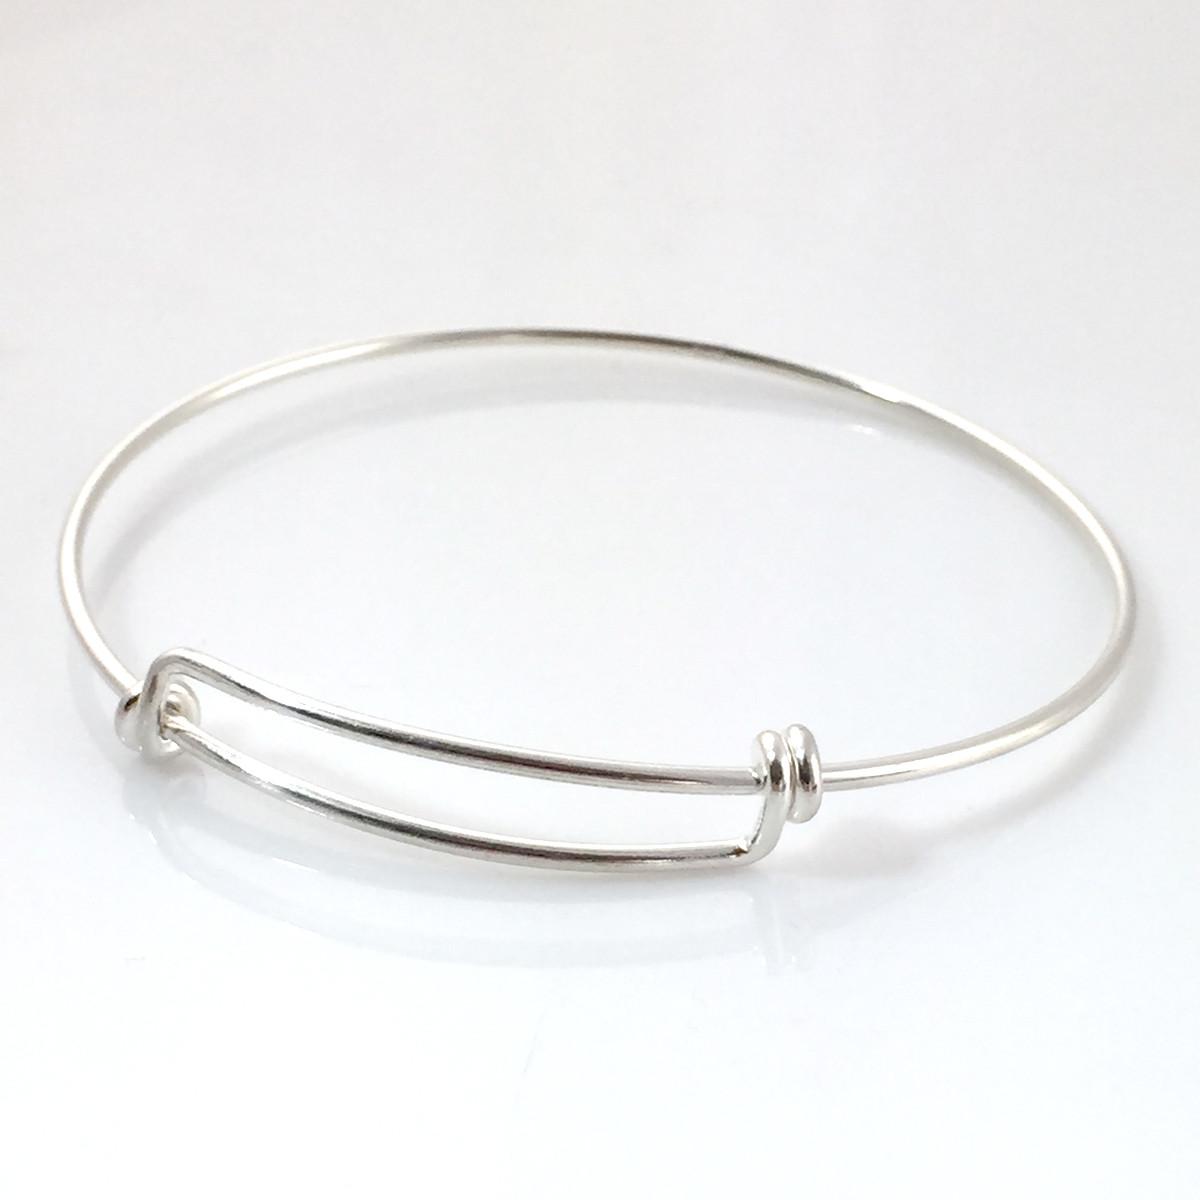 Simply Charming Bangle Bracelet